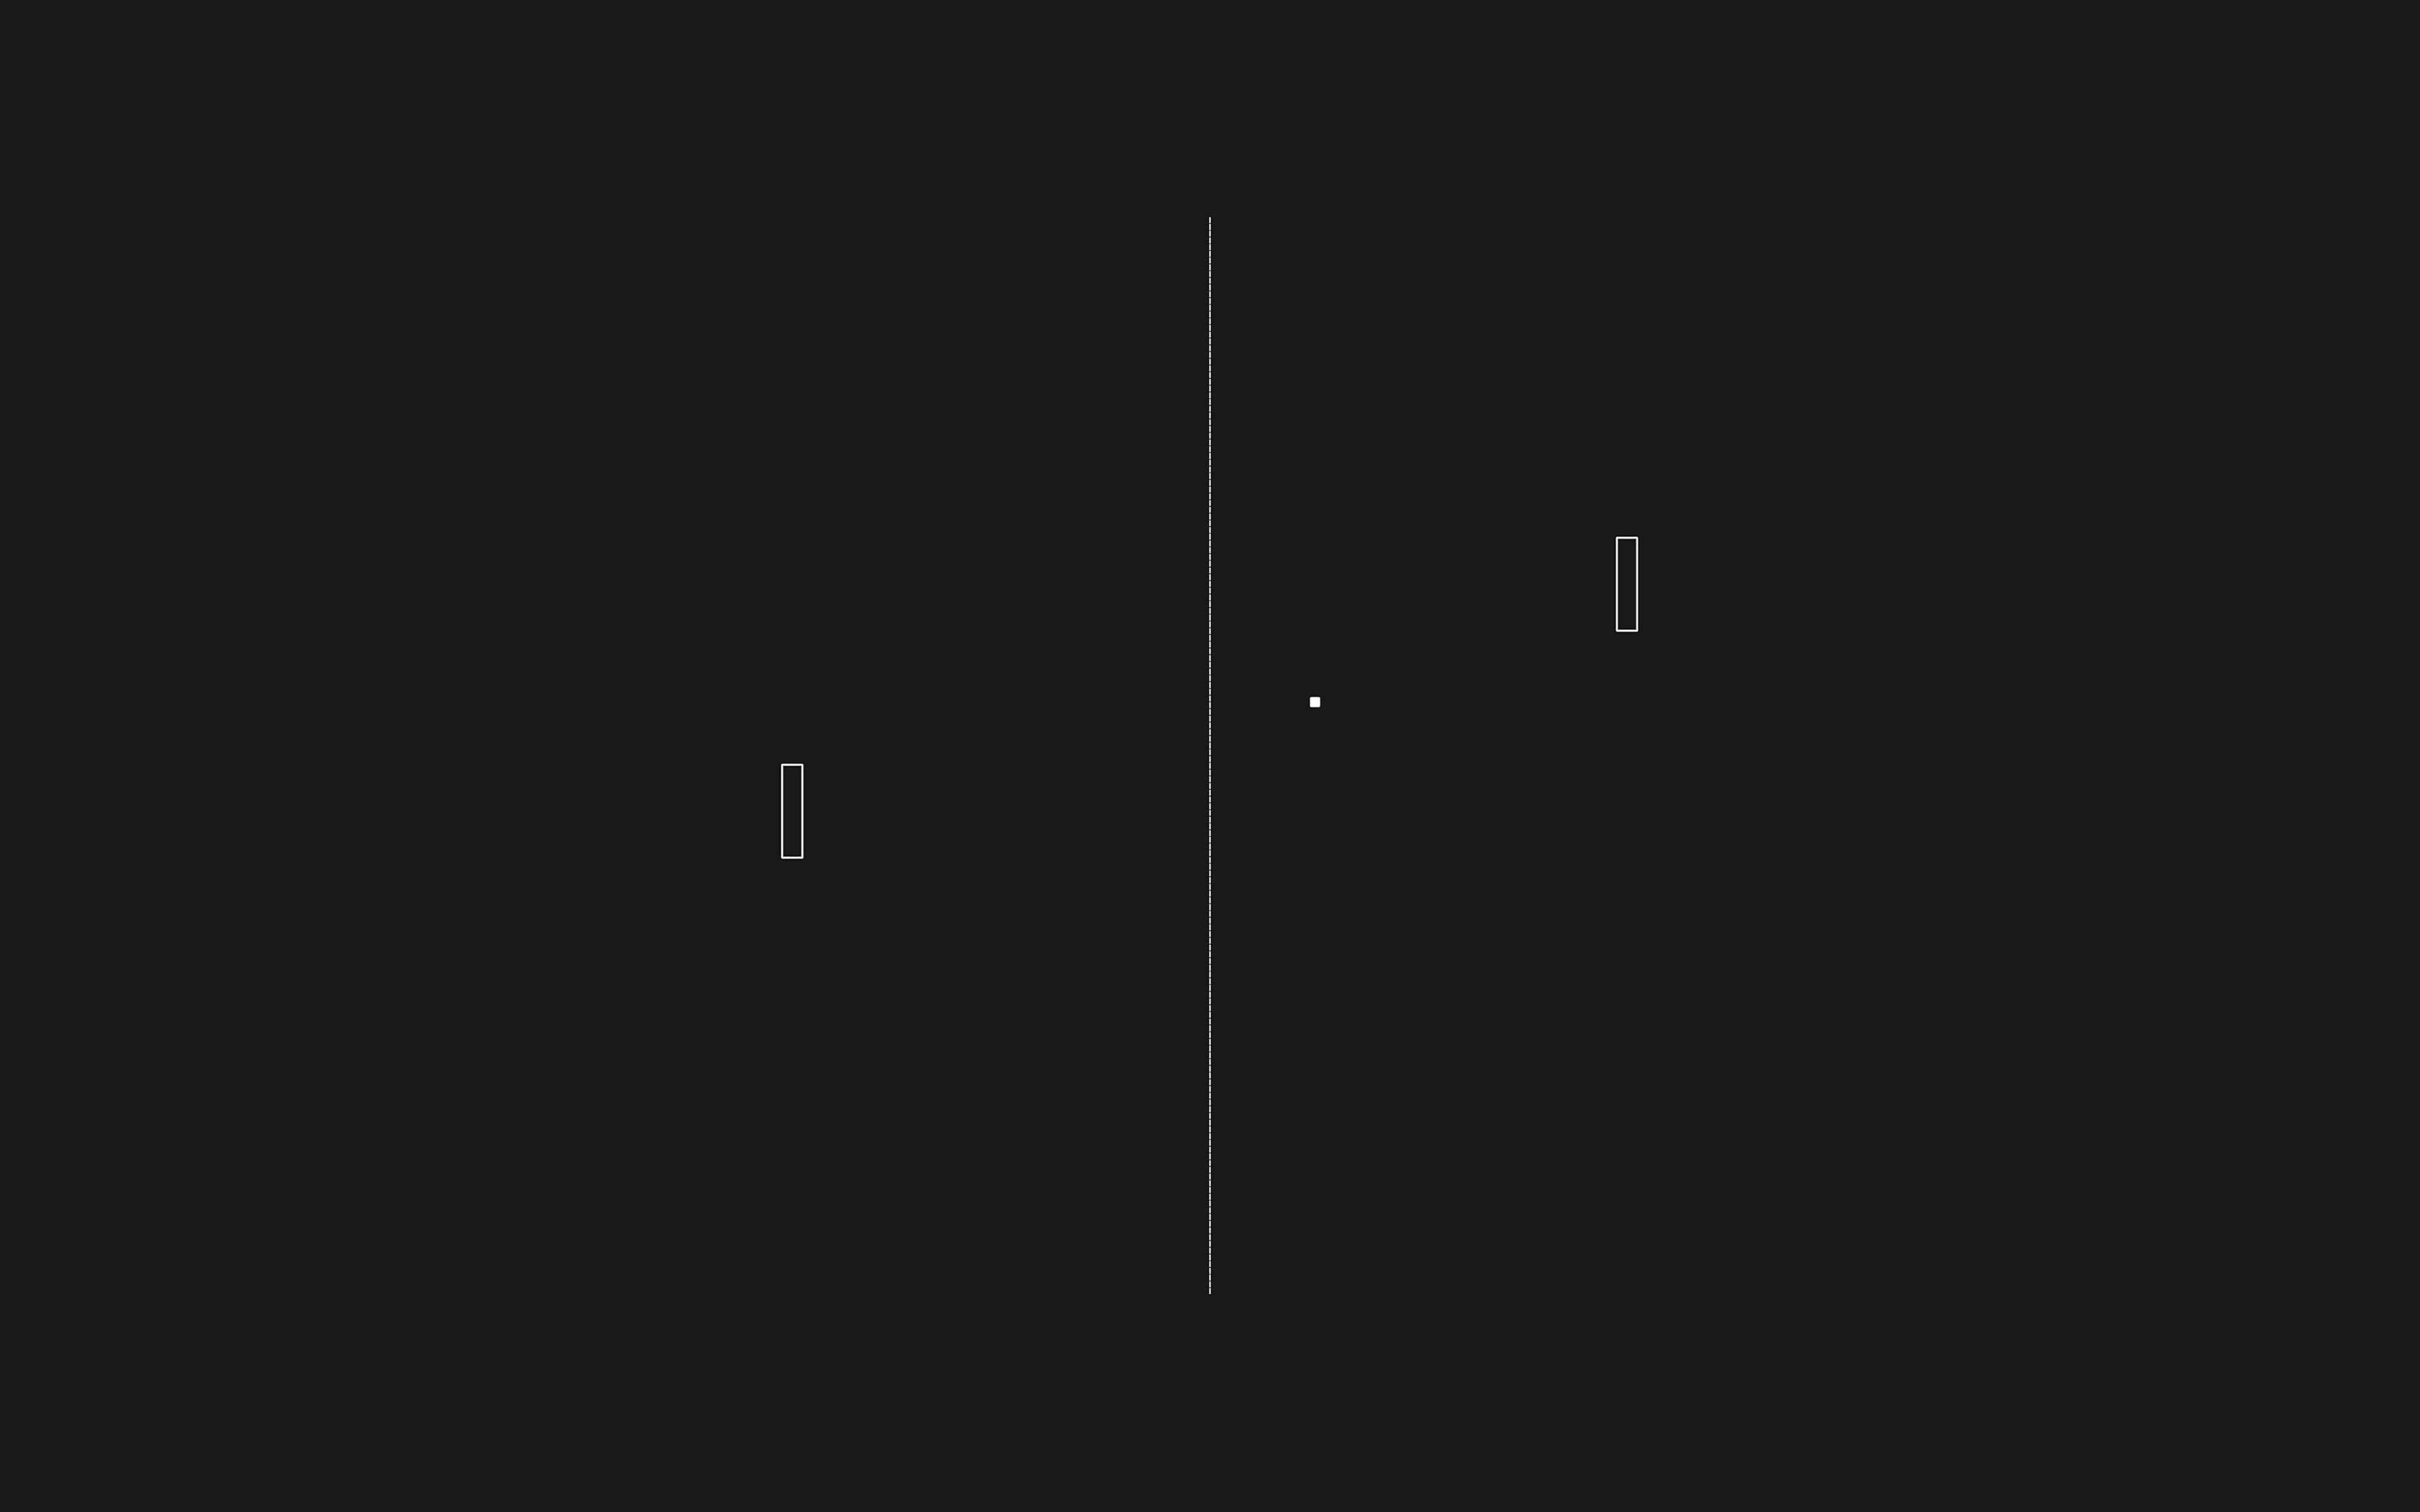 Af54 table pingpong minimal art for Minimal art essay